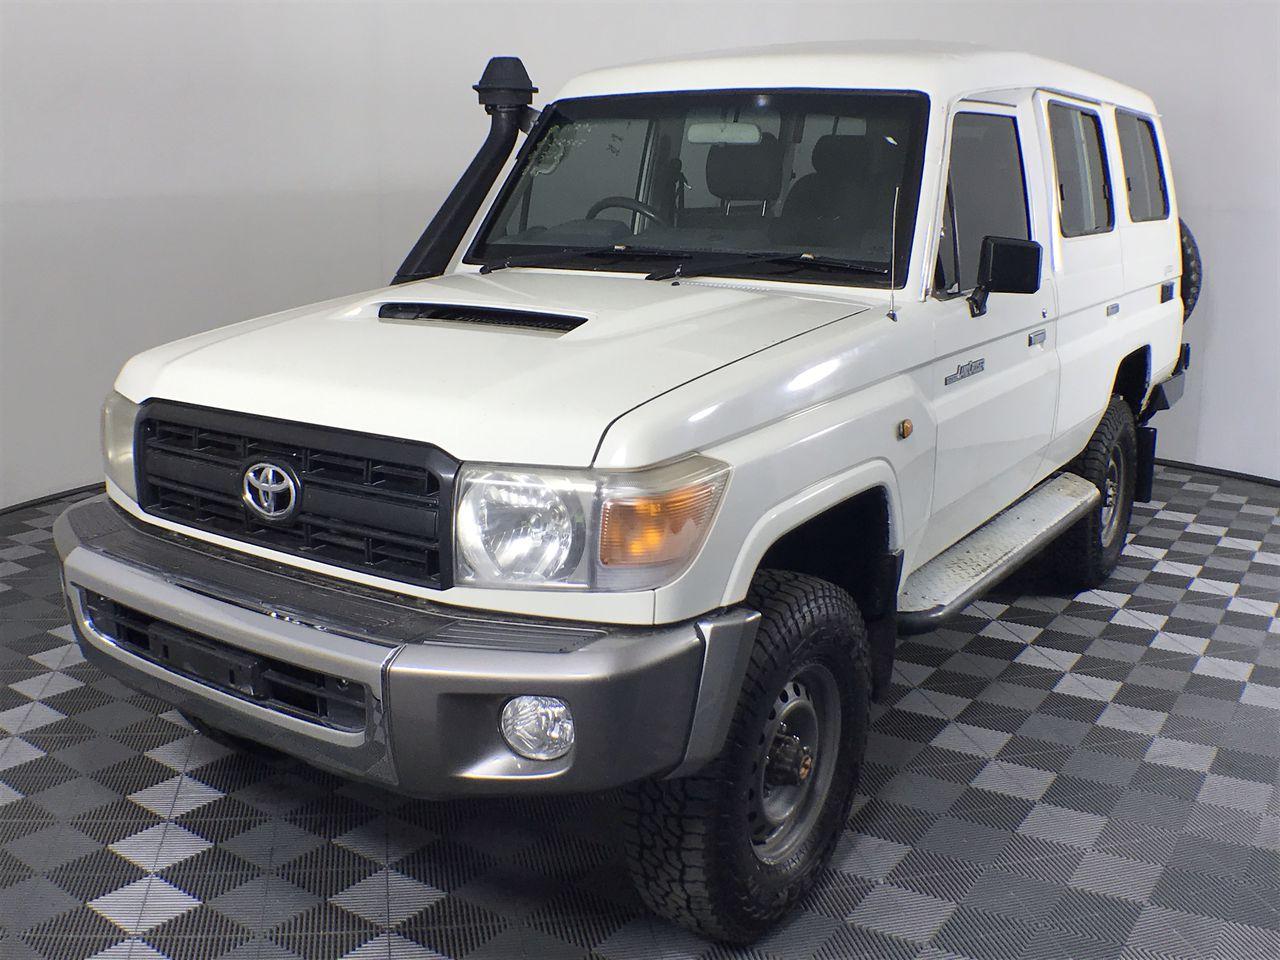 Toyota Landcruiser Workmate (4x4) VDJ78R Turbo Diesel Manual 7 Seats Wagon